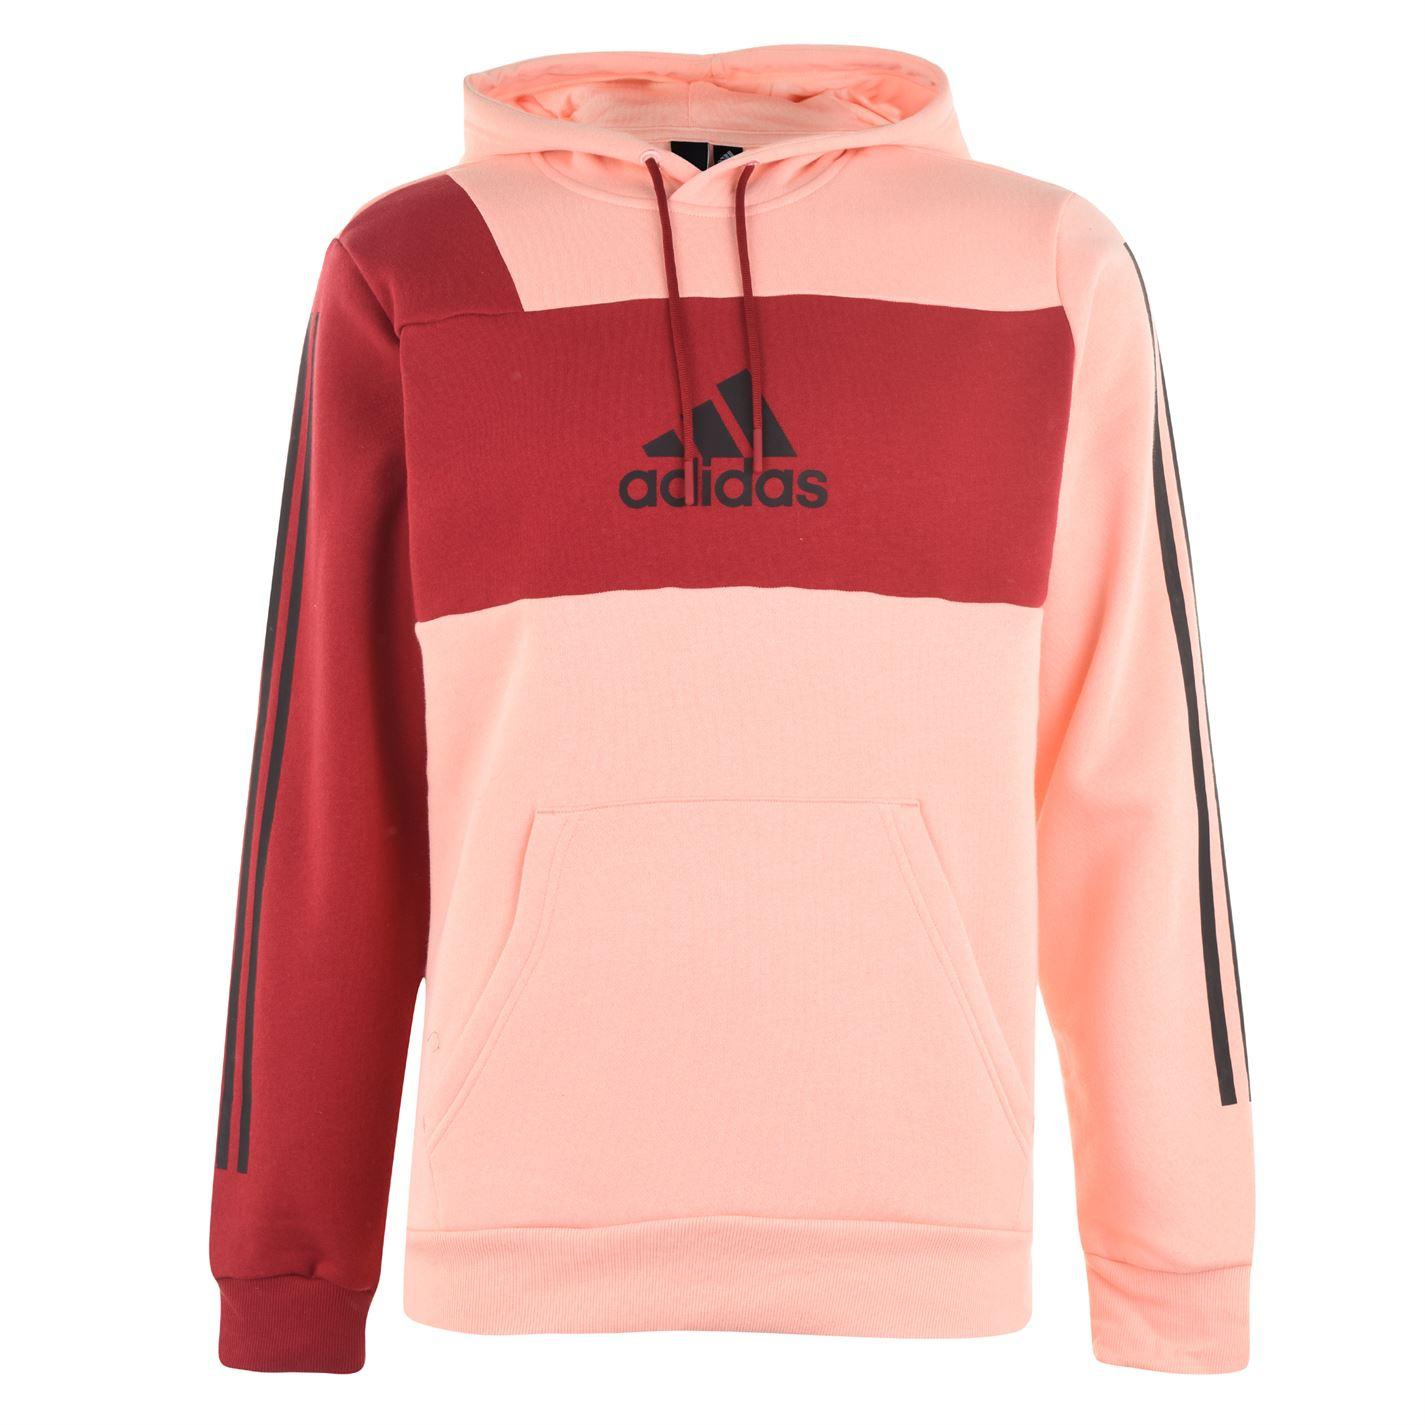 Adidas Sports ID Hoodie Mens